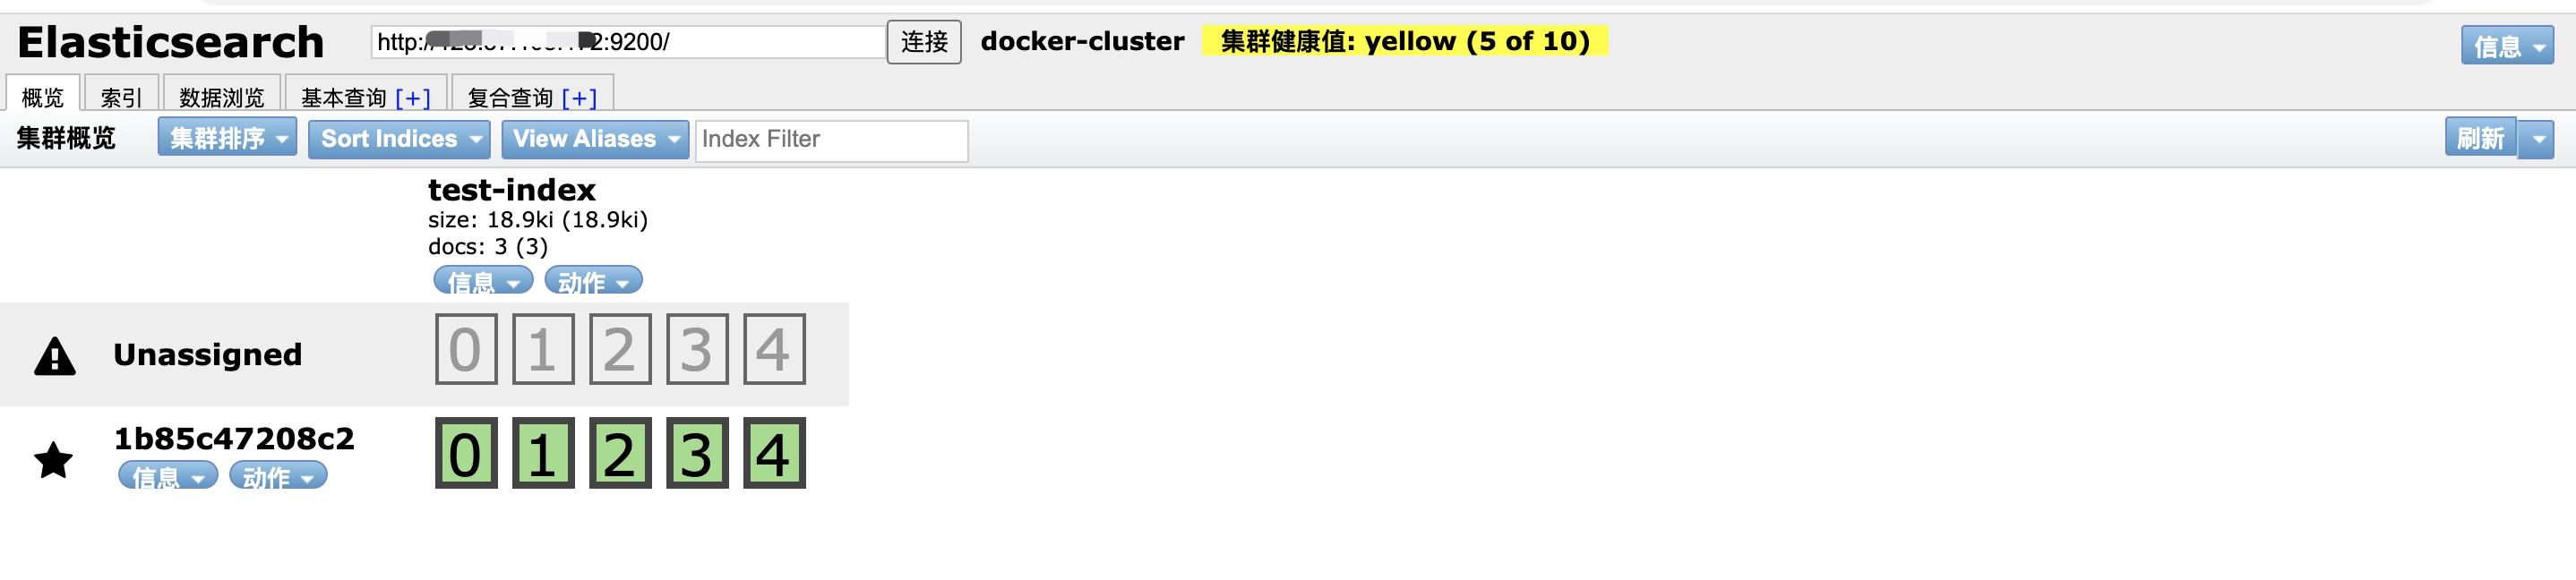 docker安装elasticsearch head插件监控管理